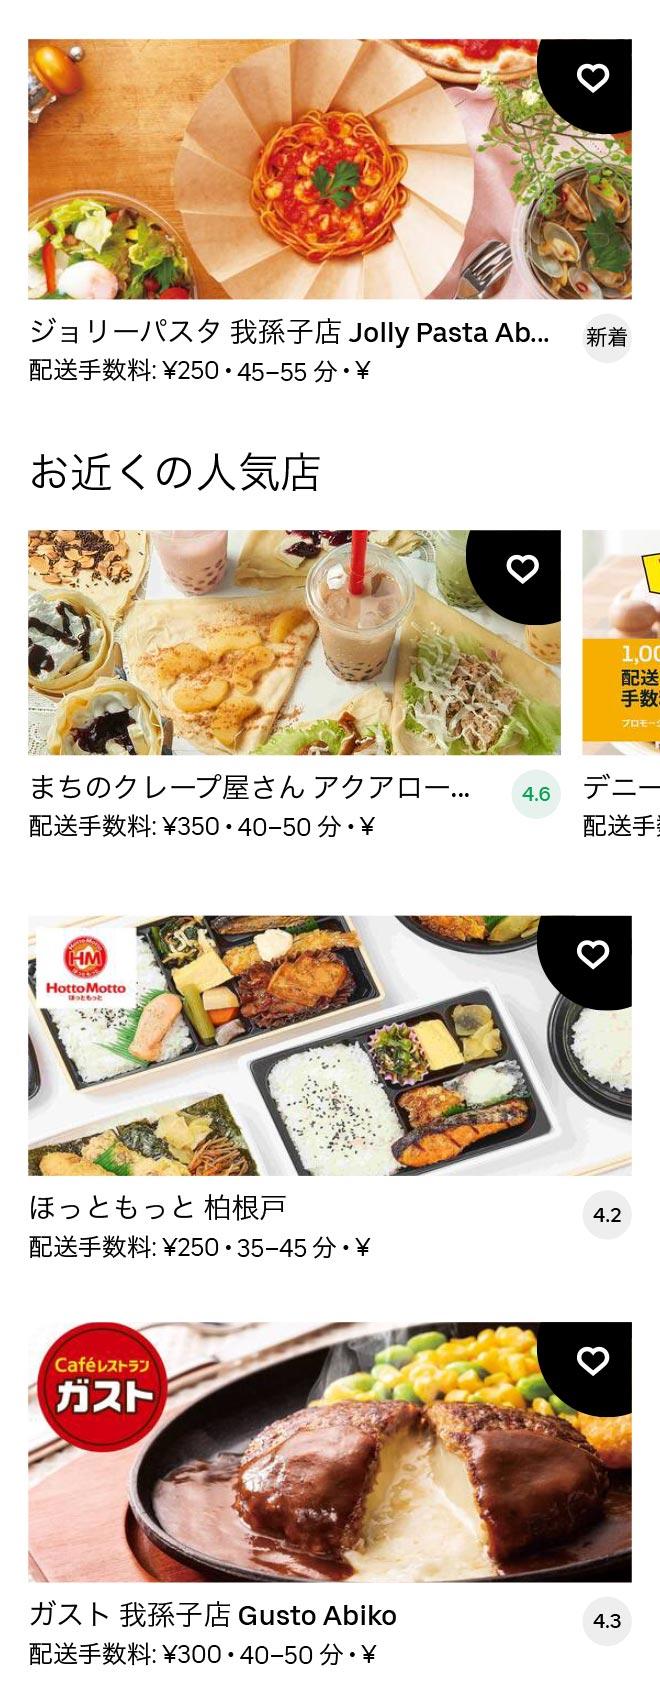 Abiko menu 2011 04